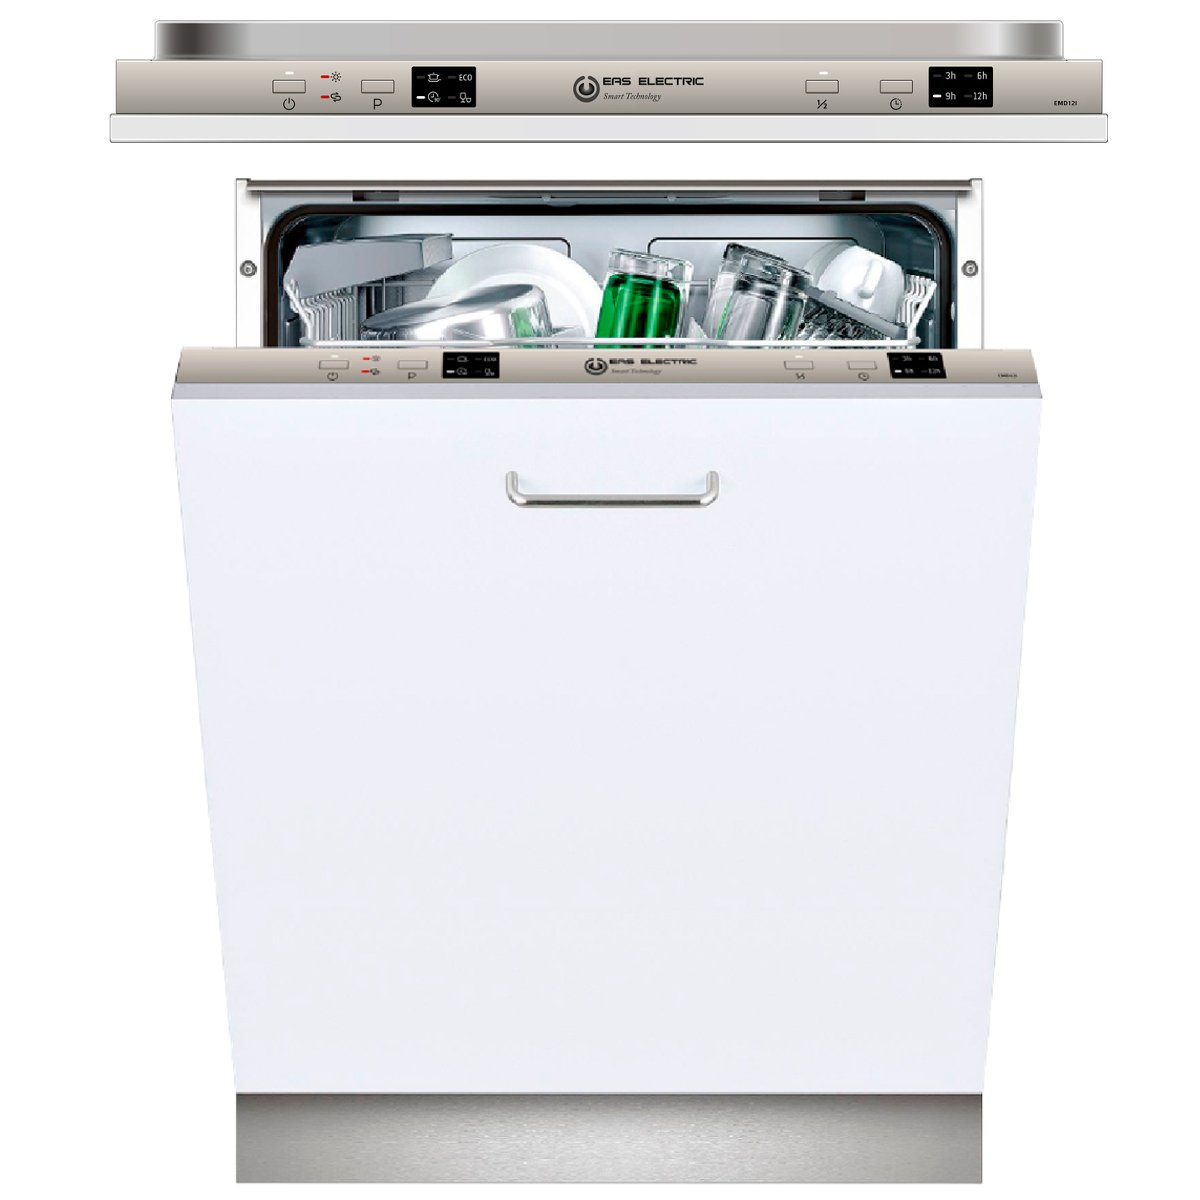 Lavavajillas Blanco Eas Electric EMD12I 60cm A+ 4 programas ...